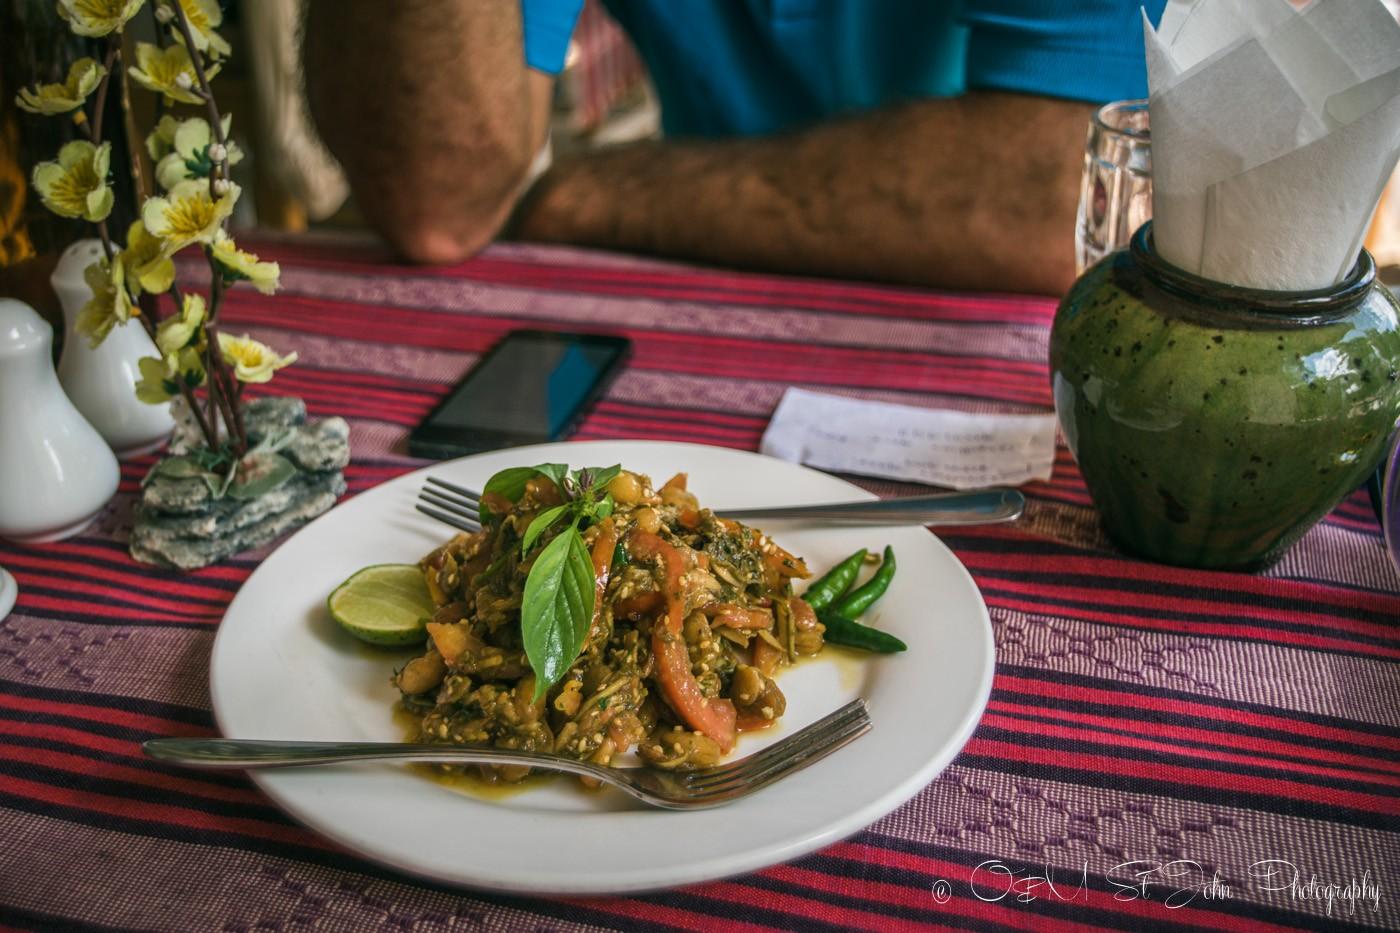 3 days in Yangon: Tea leaf salad, a Burmese specialty. Myanmar